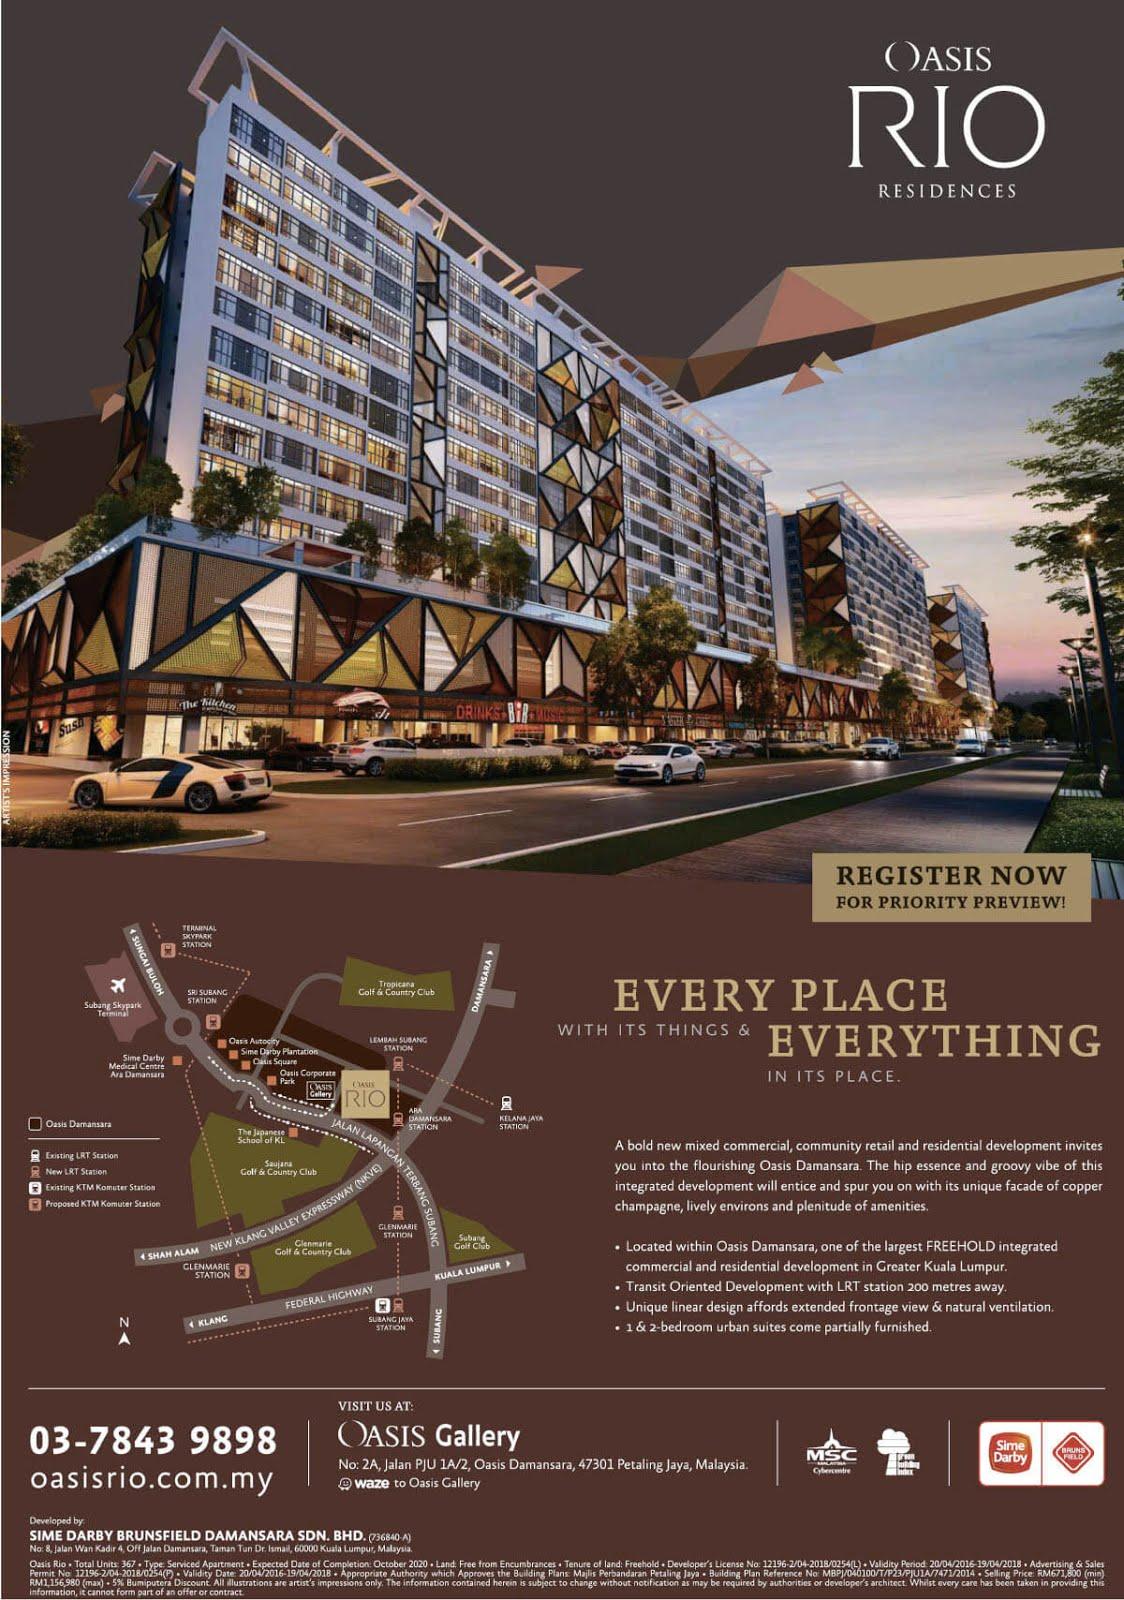 OASIS RIO Residences Serviced Apartment Brochure